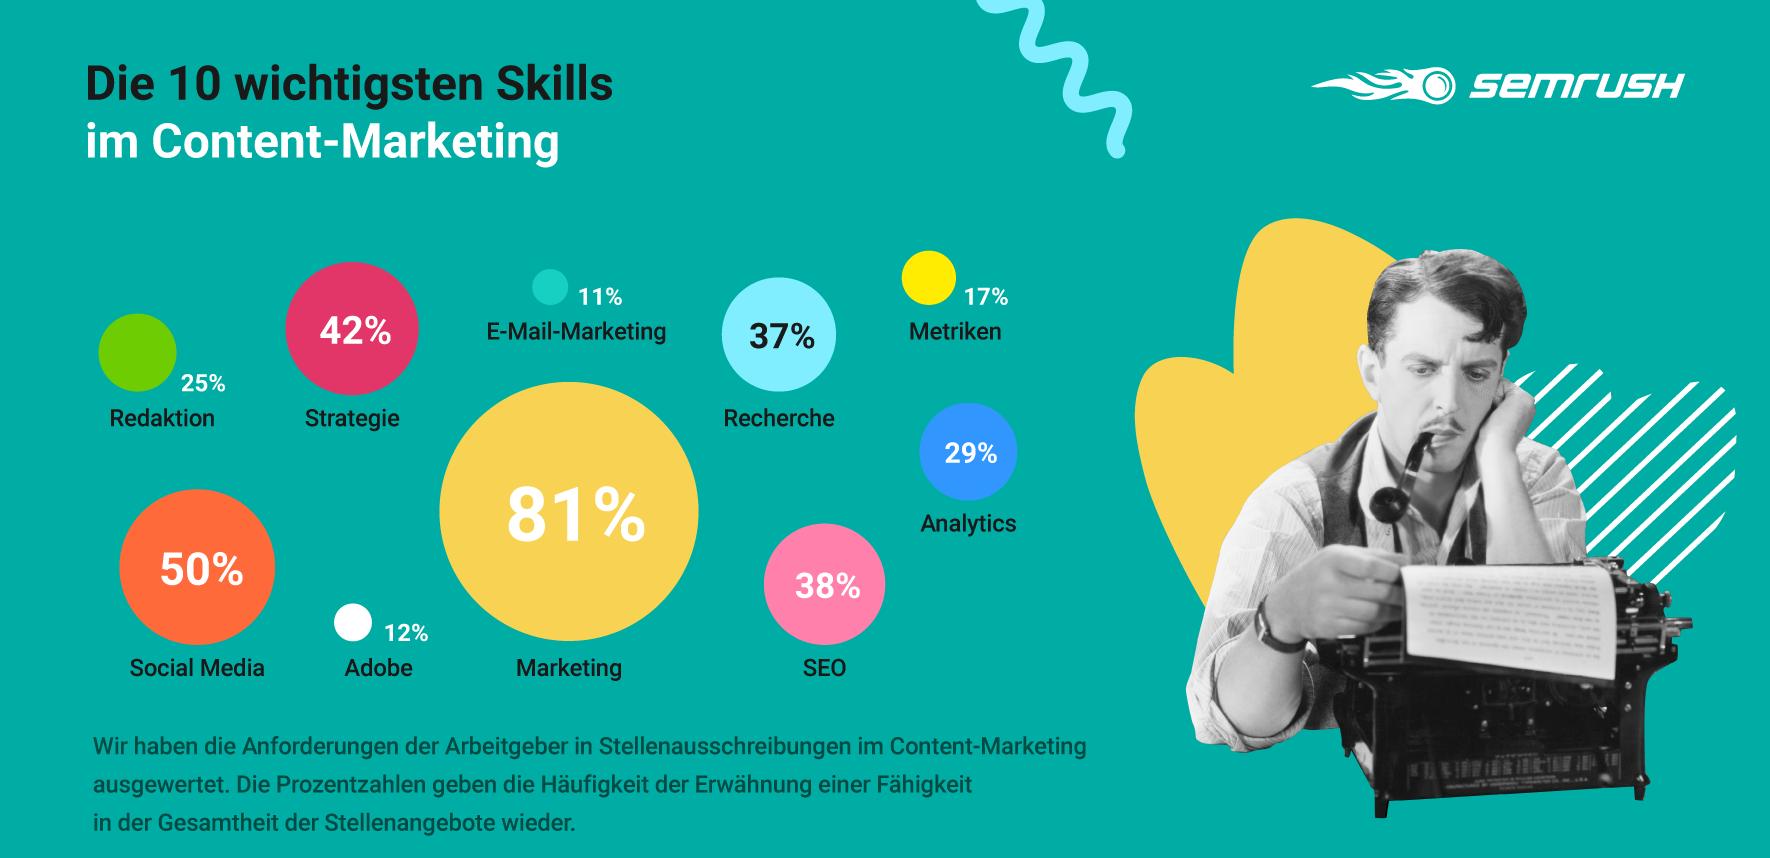 Content-Marketing: Skills